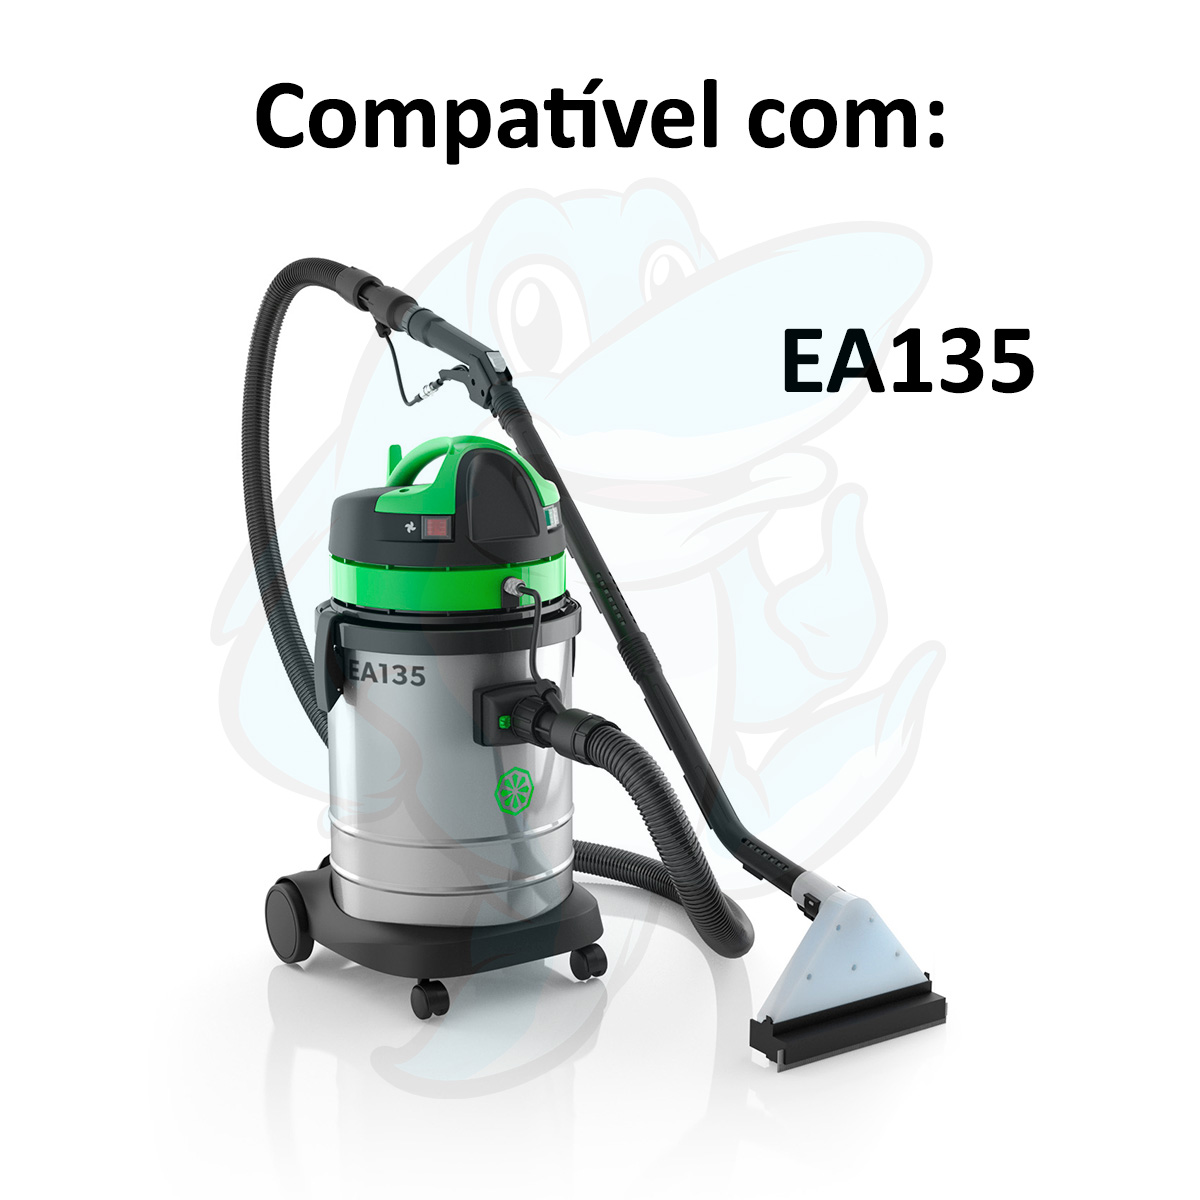 Bomba para Extratora IPC EA135, EP150, Lava, Lavaclean, Lava Pro 127v Original